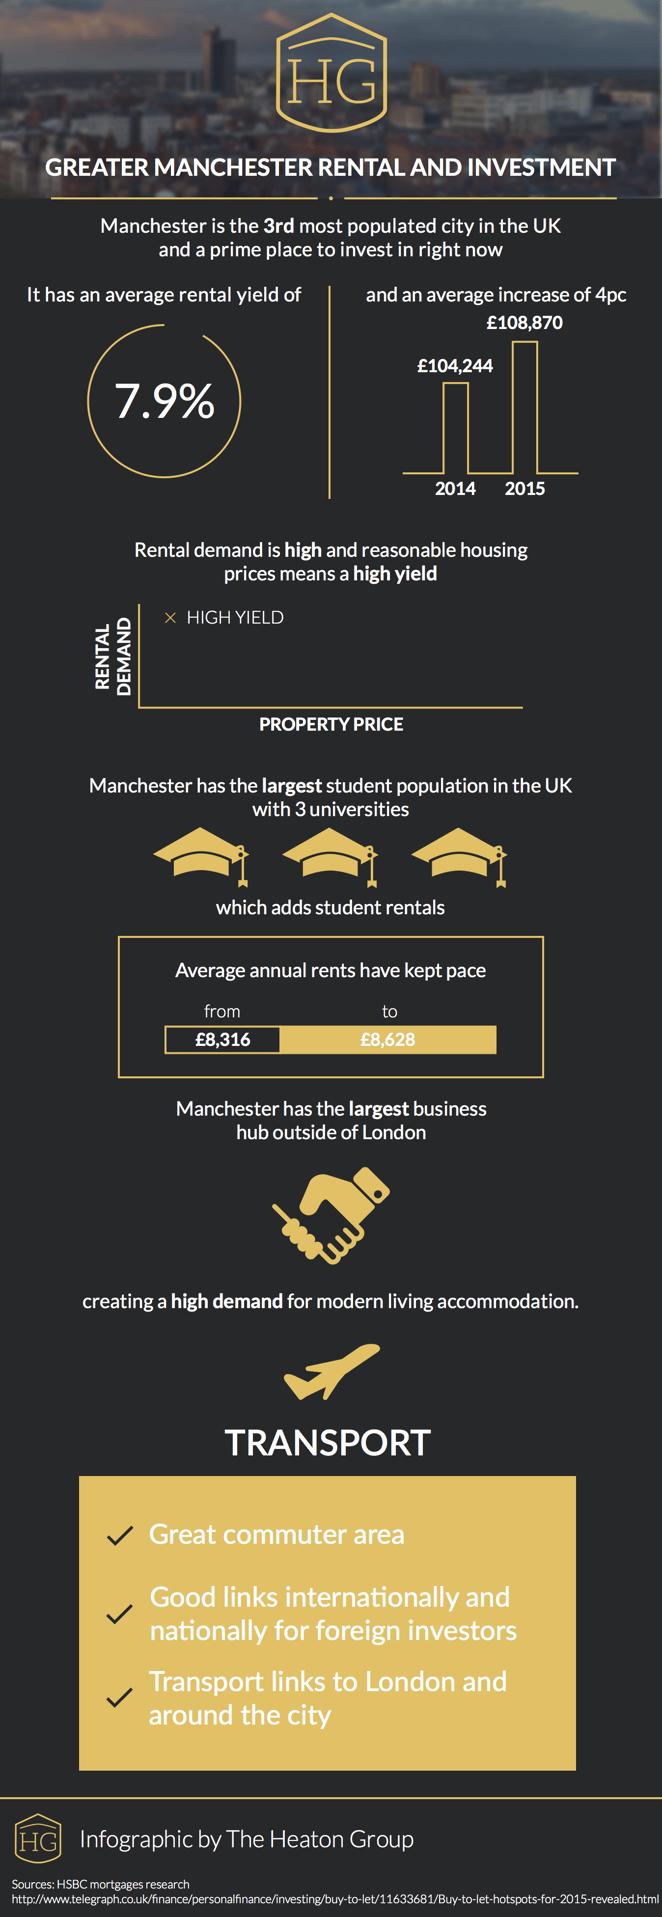 [Infographic] Manchester Rental Demand